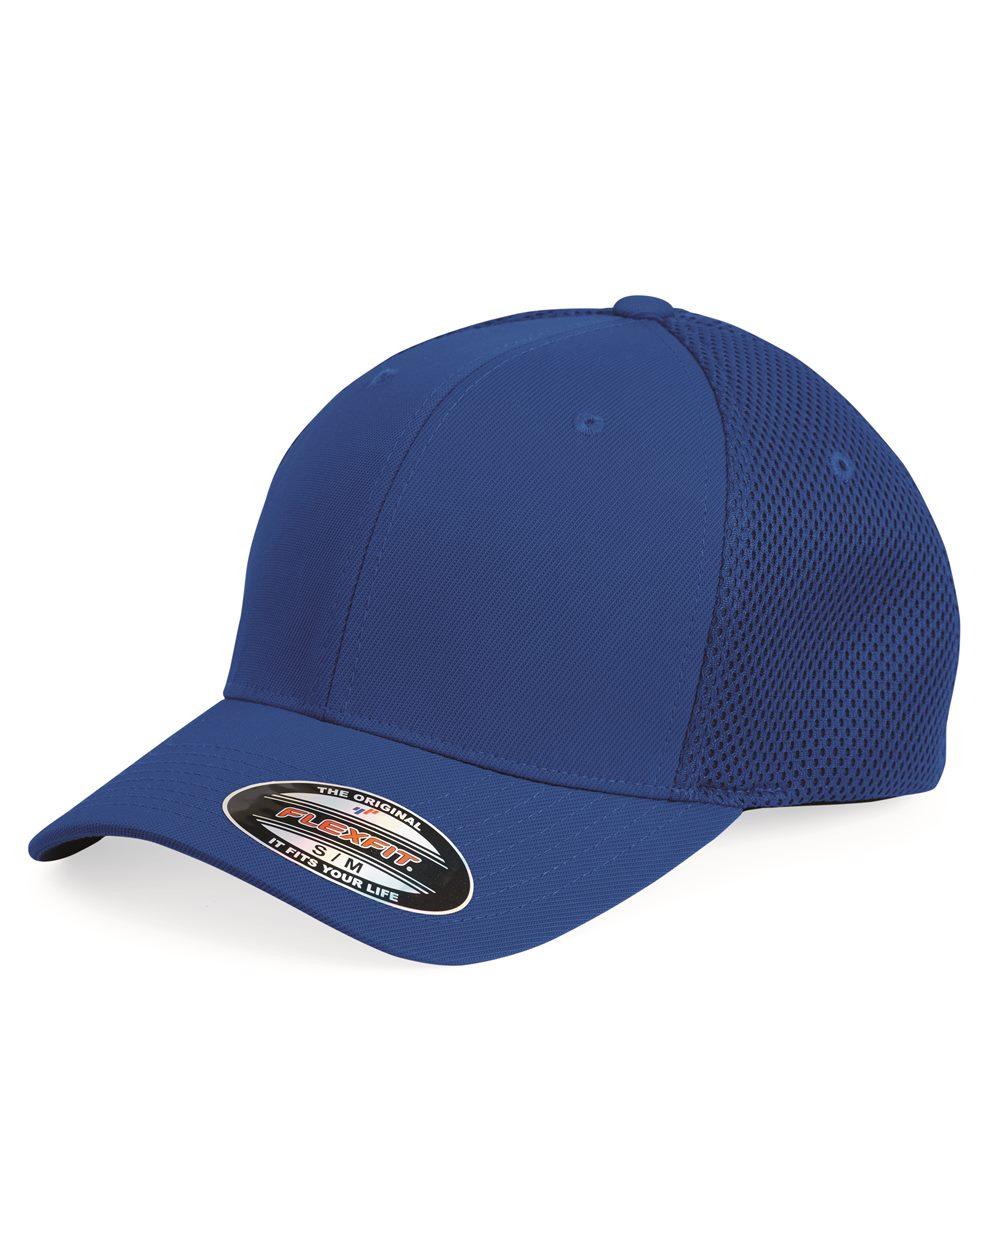 Flexfit 6533 - Ultrafiber Mesh Cap